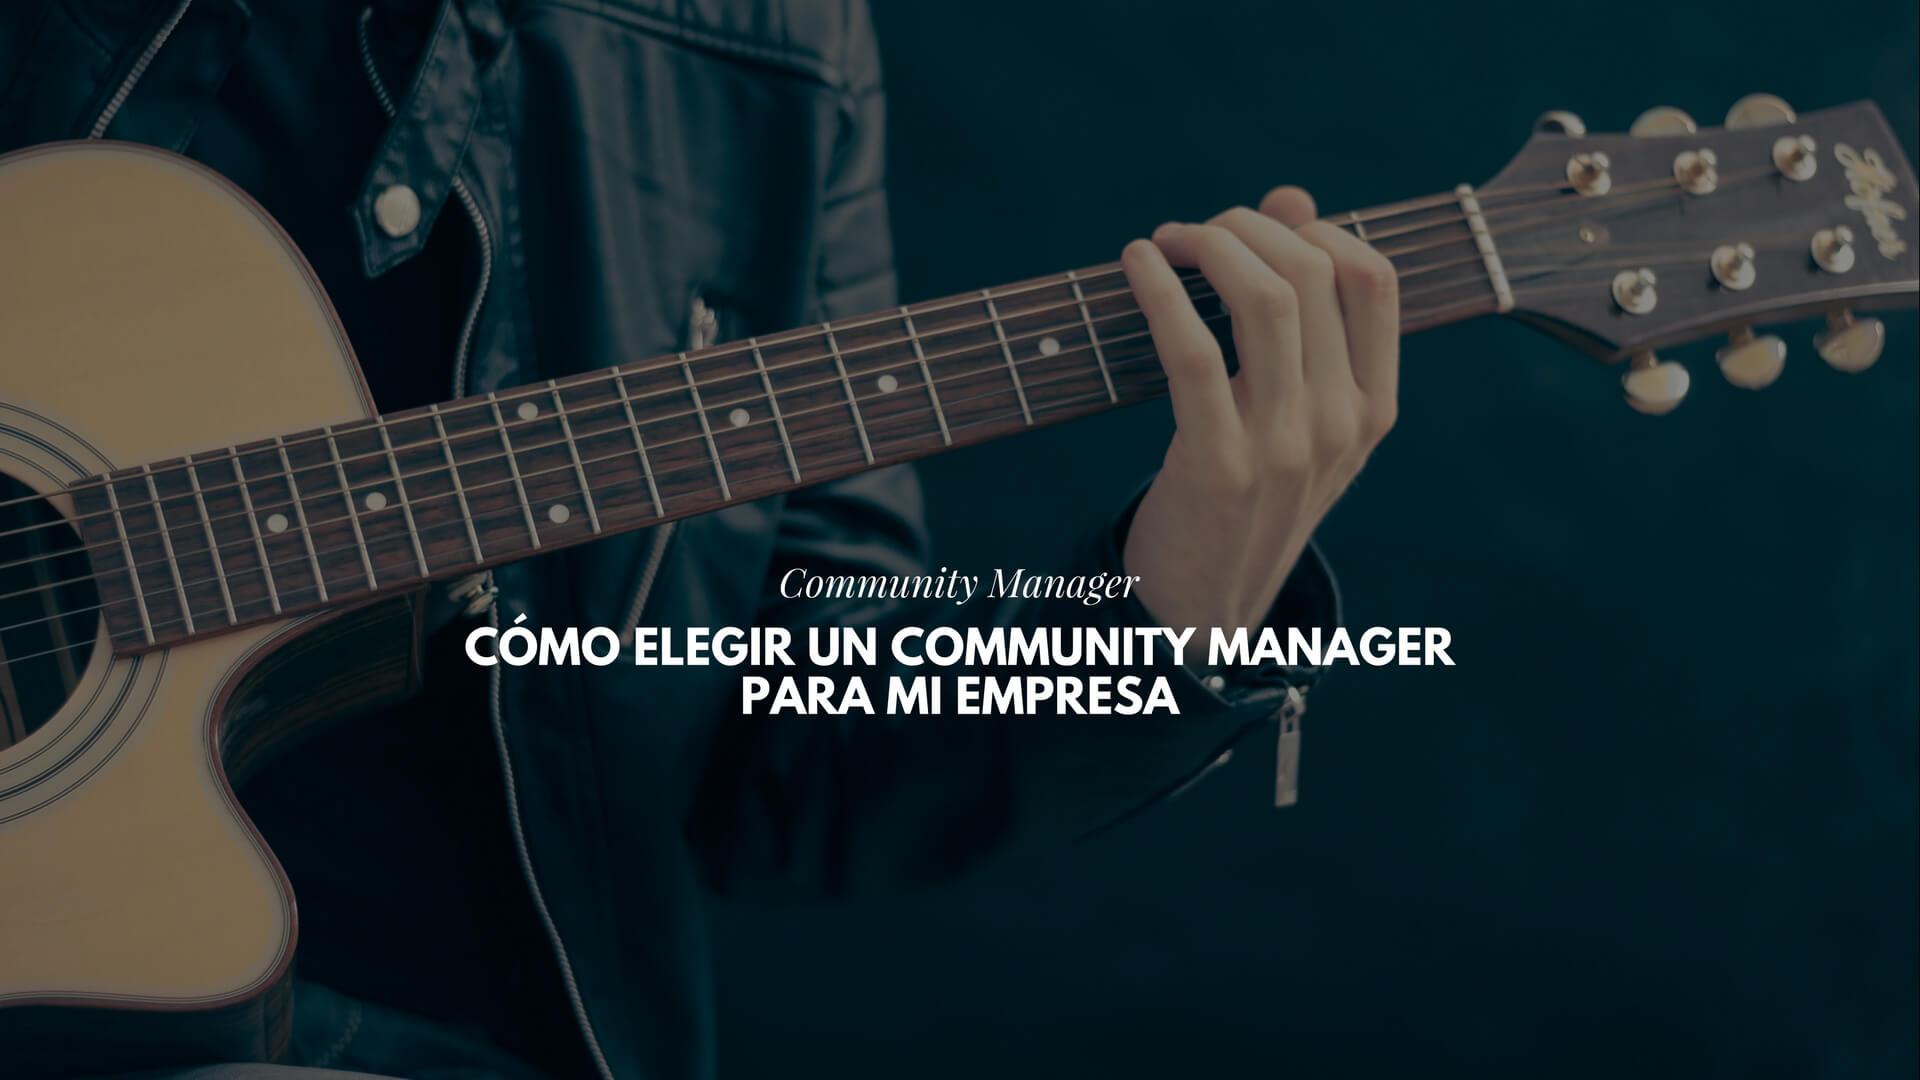 Cómo elegir un Community Manager para mi empresa